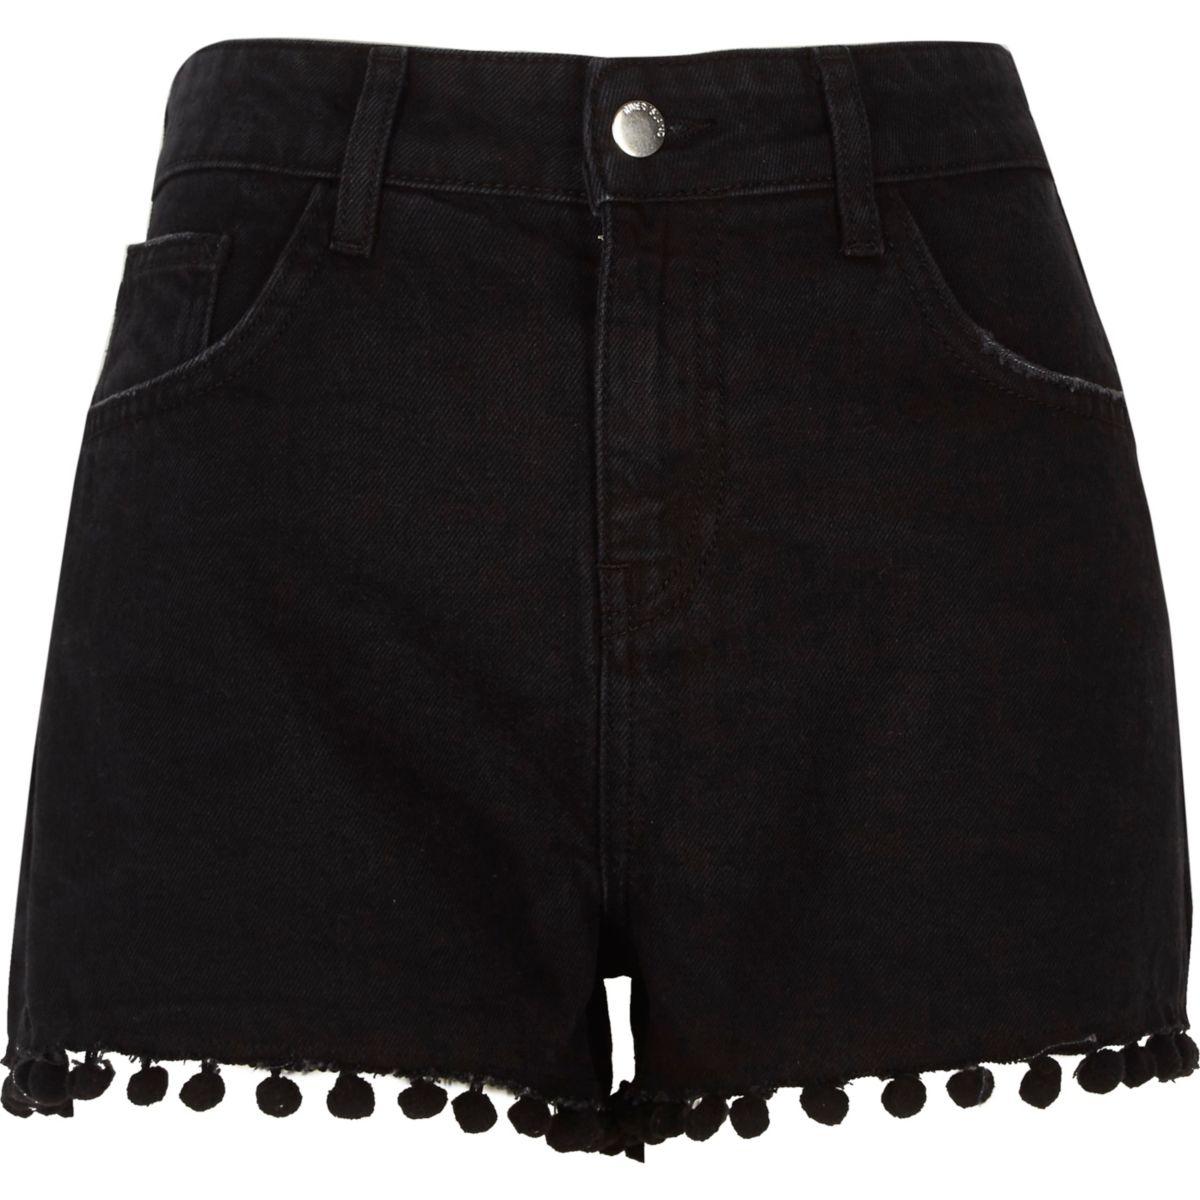 Zwarte wash denim short met hoge taille en pompons